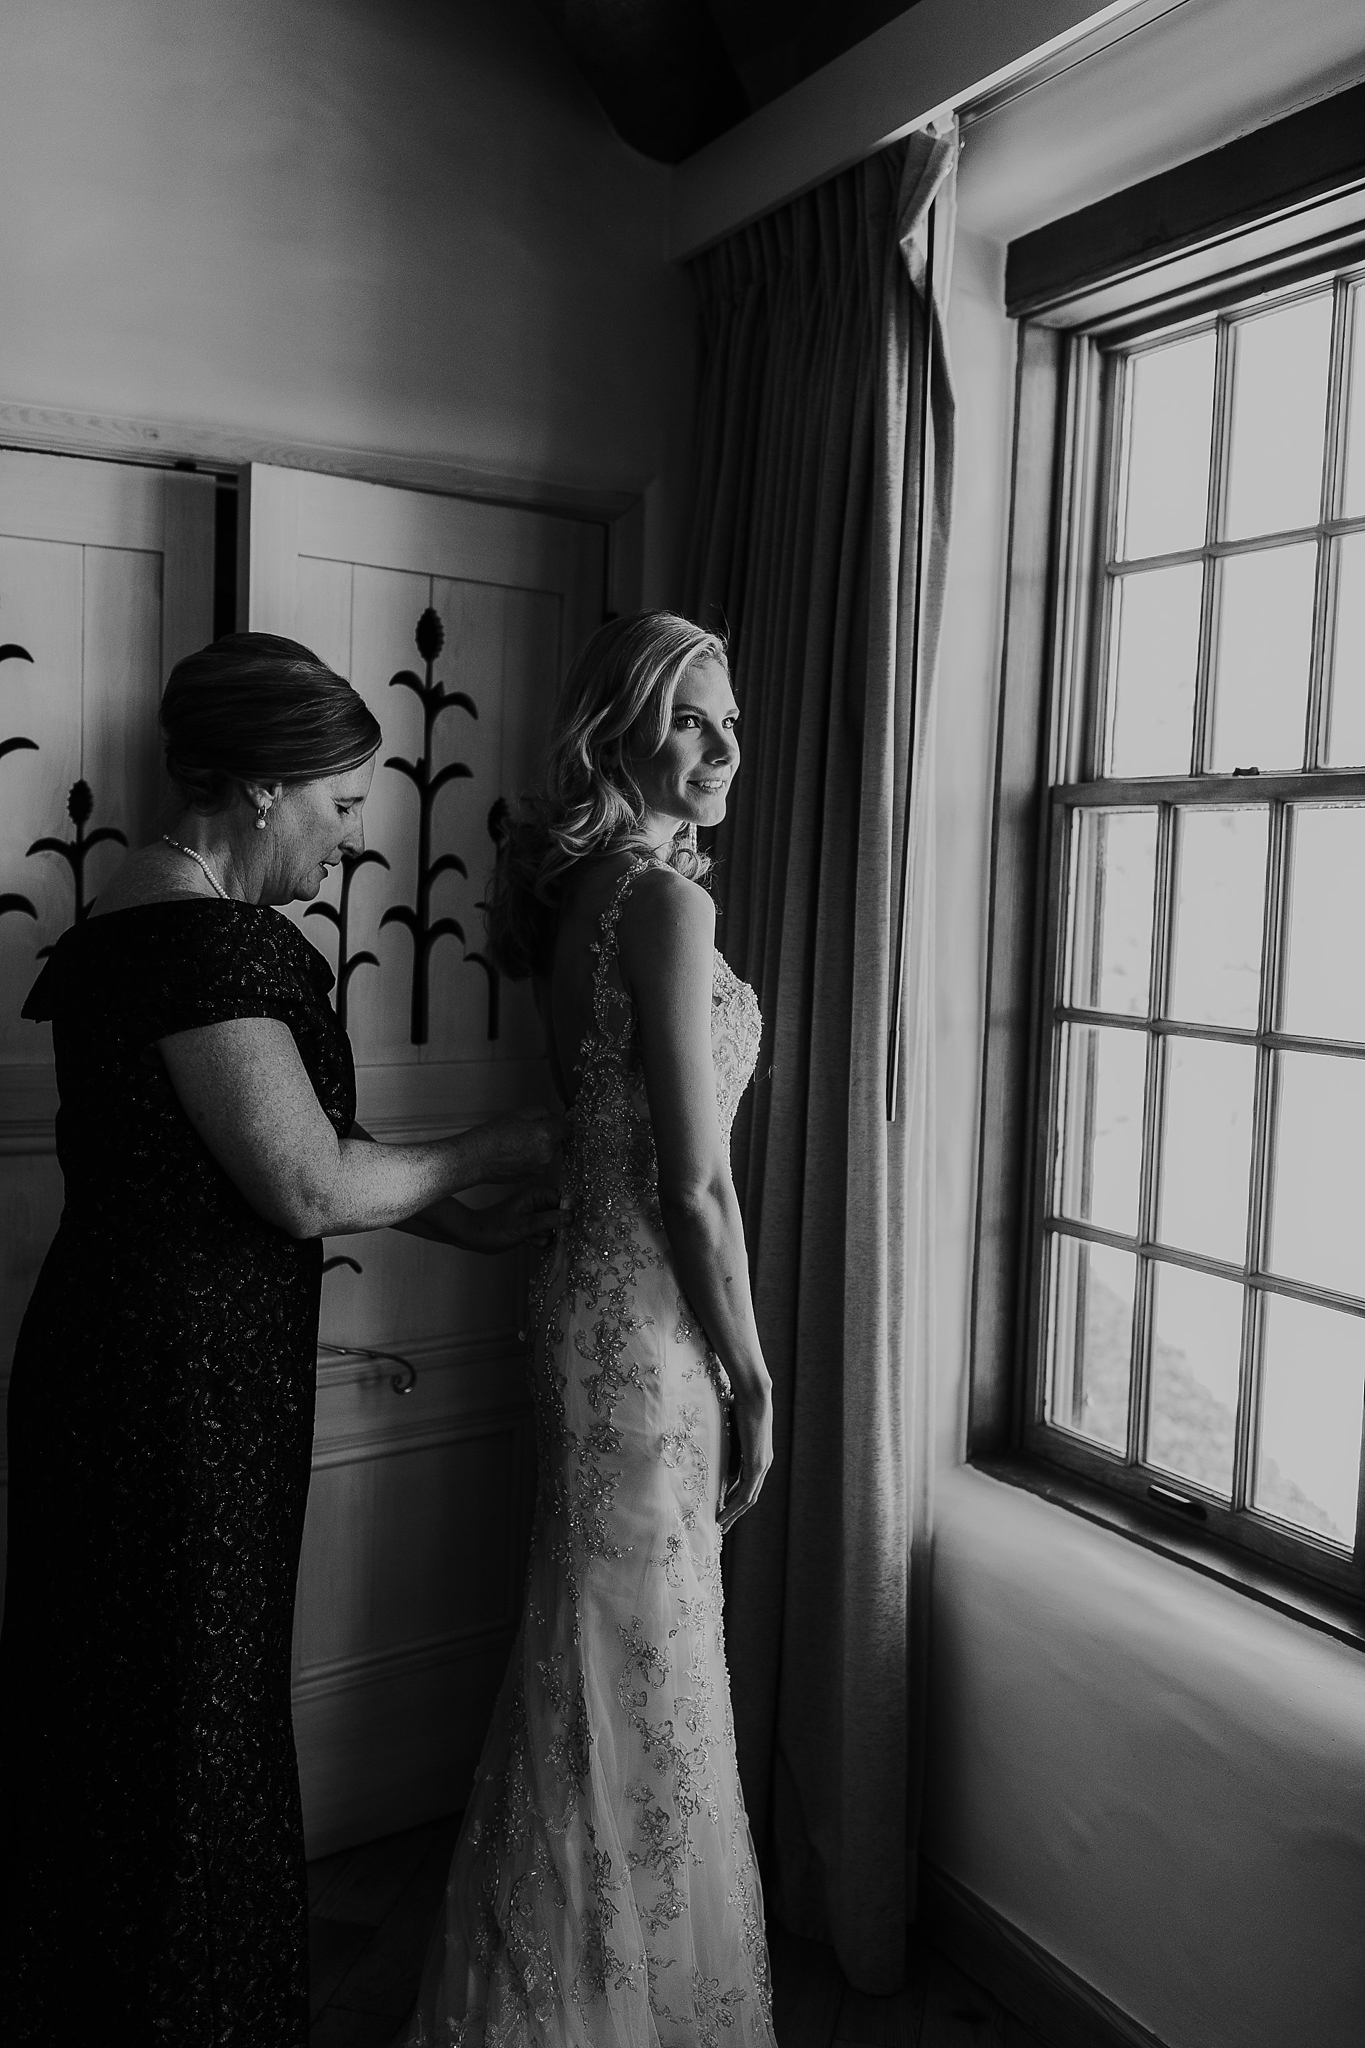 Alicia+lucia+photography+-+albuquerque+wedding+photographer+-+santa+fe+wedding+photography+-+new+mexico+wedding+photographer+-+new+mexico+wedding+-+family+photographer+-+mothers+day+-+mother+of+the+bride_0013.jpg